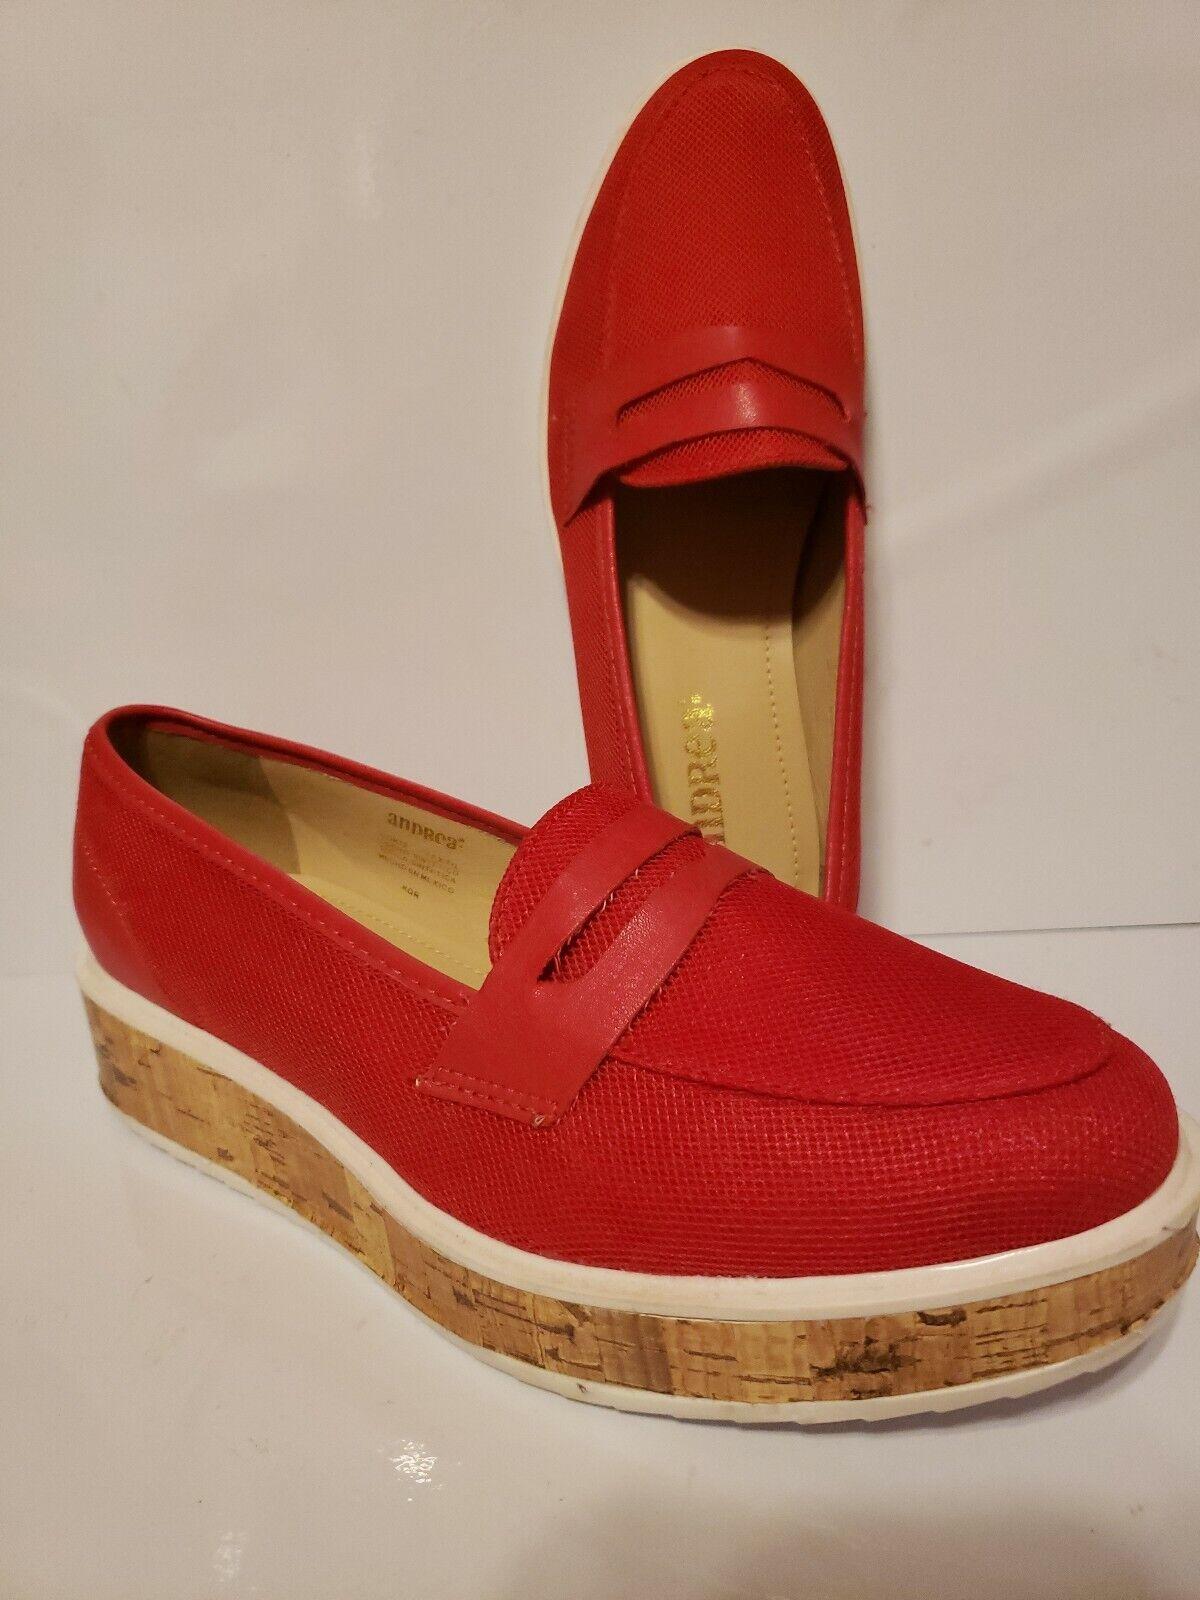 Red Platform Cork Andrea Brand Slip On Loafers Size 7½